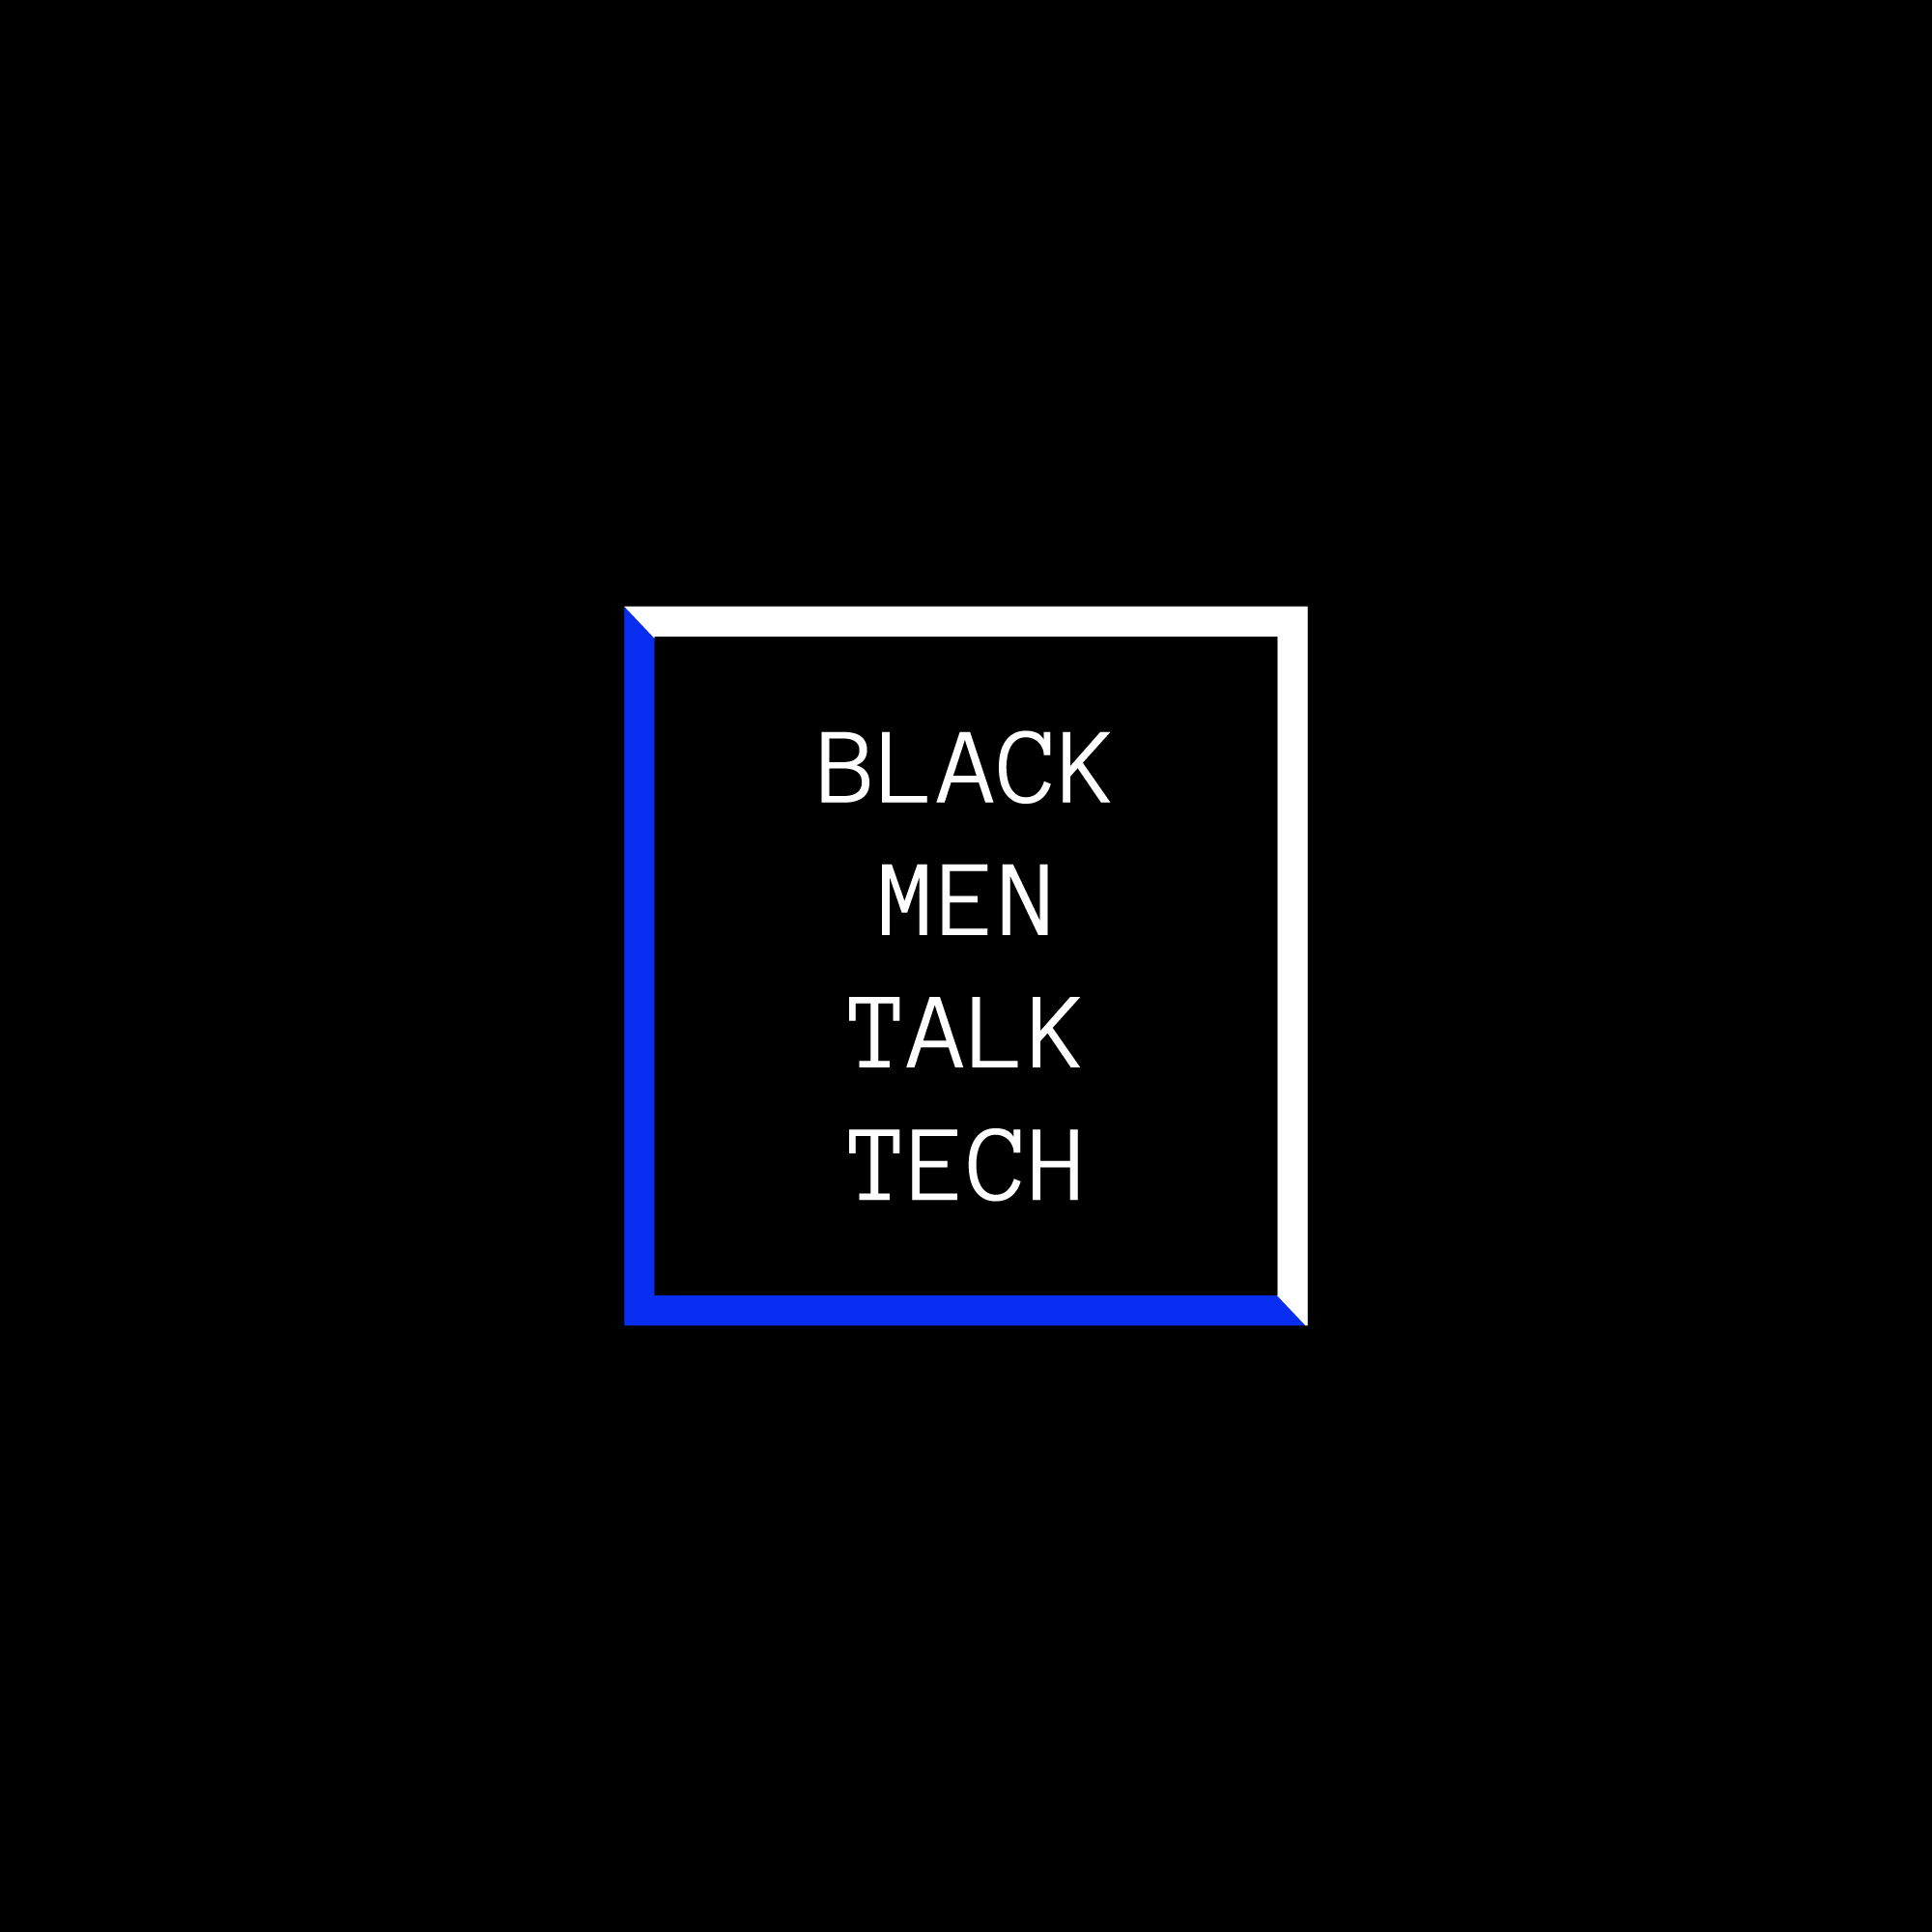 Black Men Talk Tech logo, white text, black background